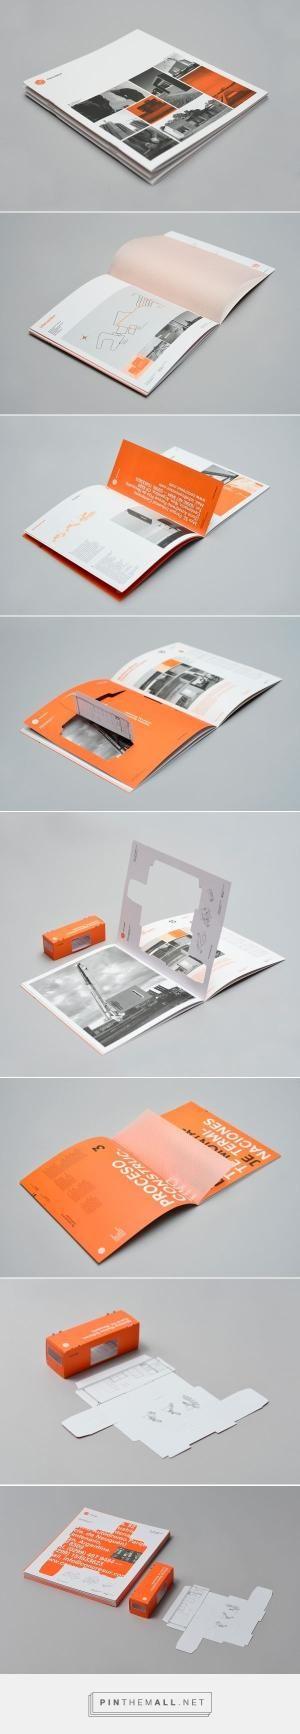 CONCRESUR Corporate Brochure by Hachetresele Studio by lizzie